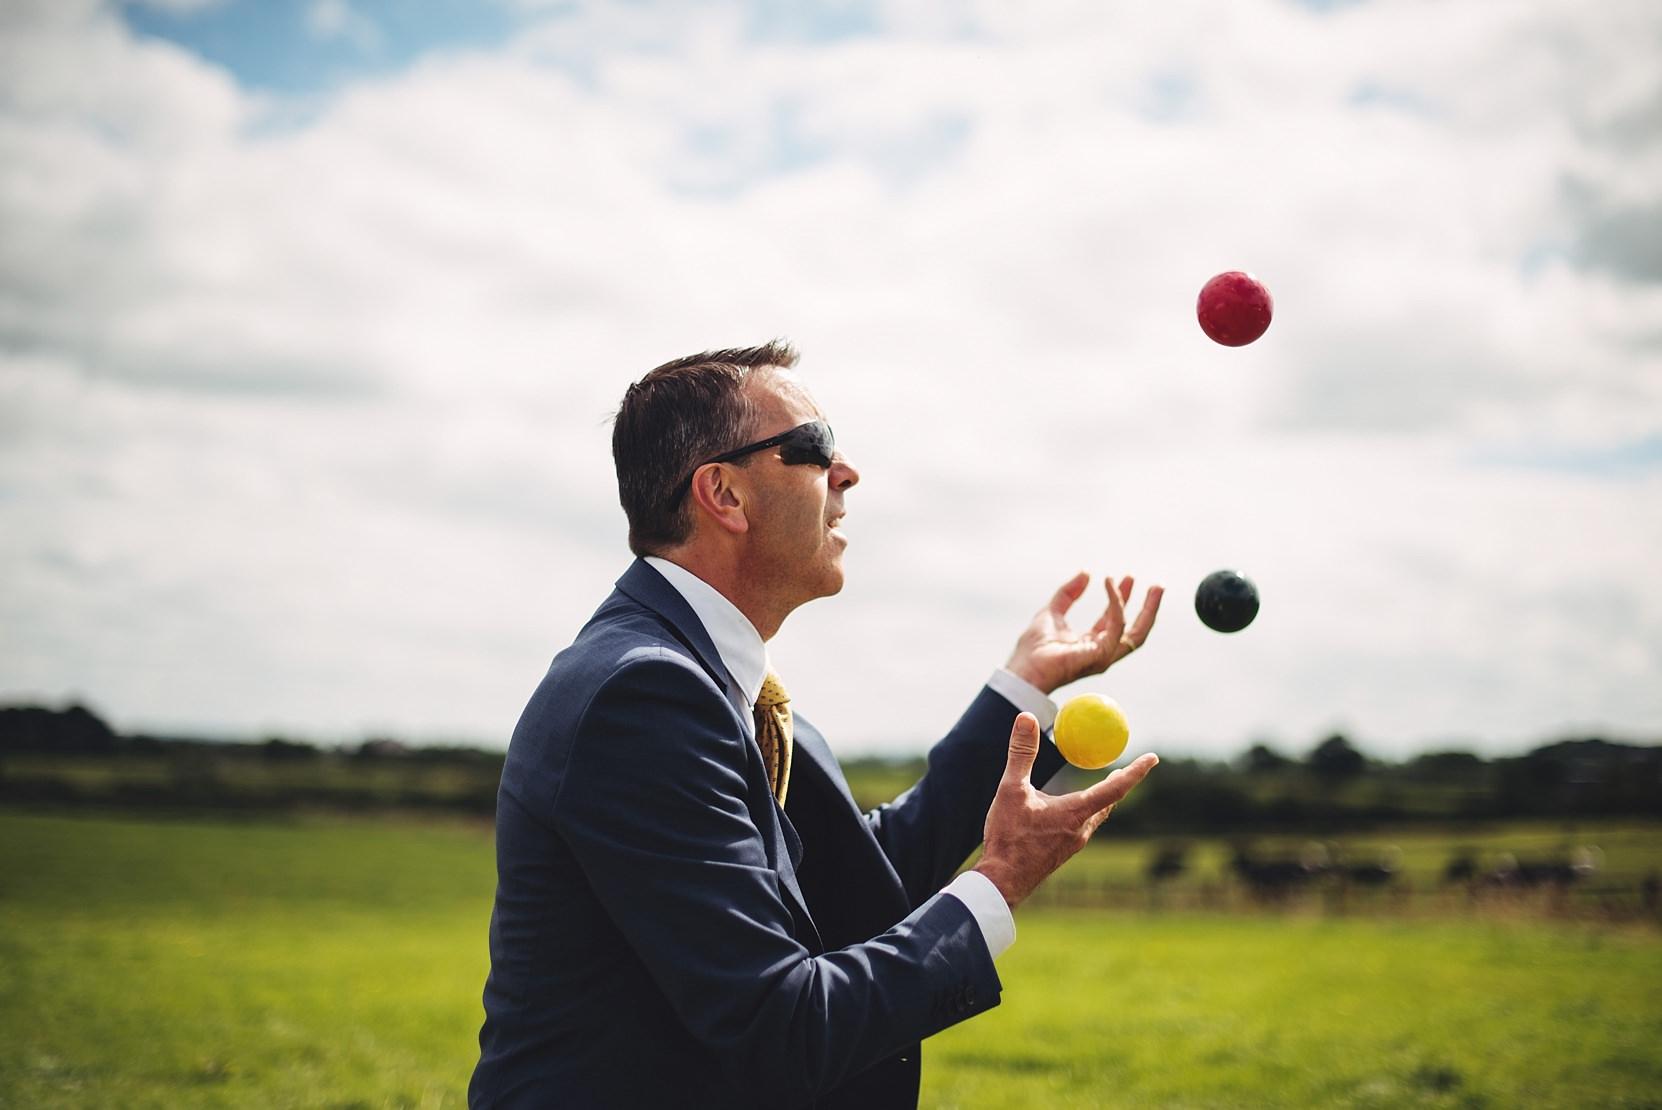 The best man juggling